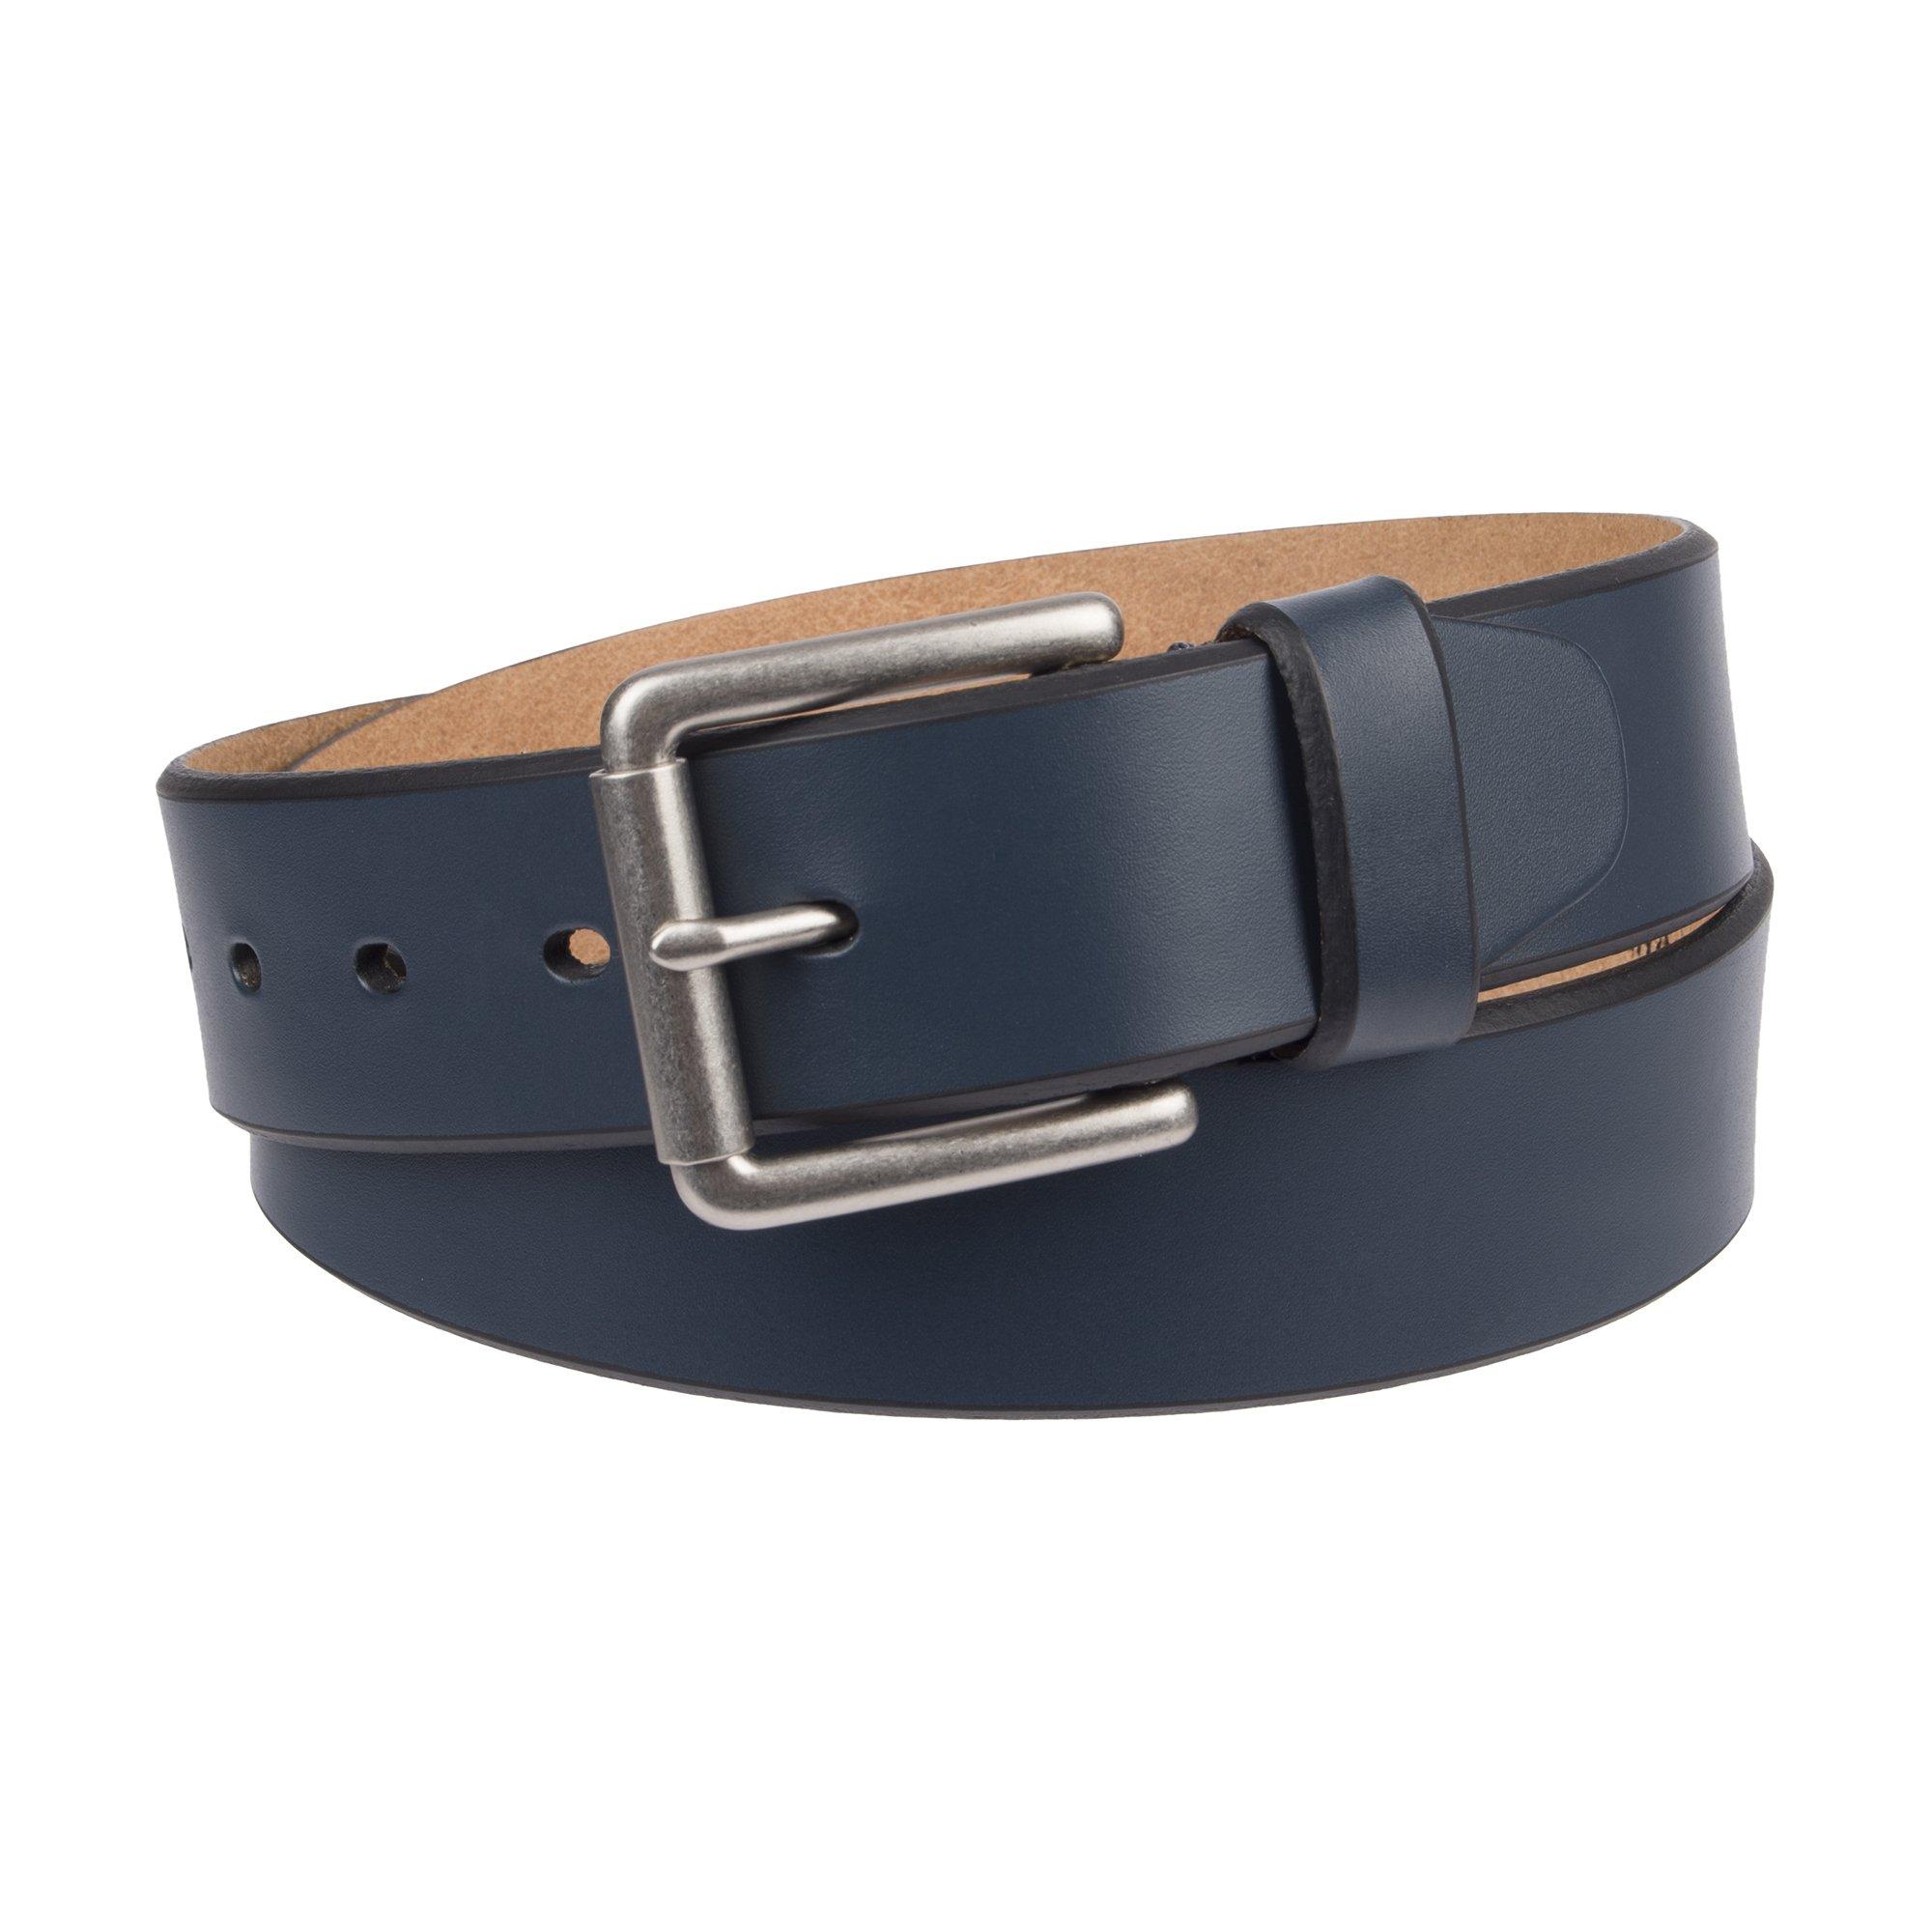 Dockers Men's 1 1/2 In. Leather Bridle Belt-navy, 32